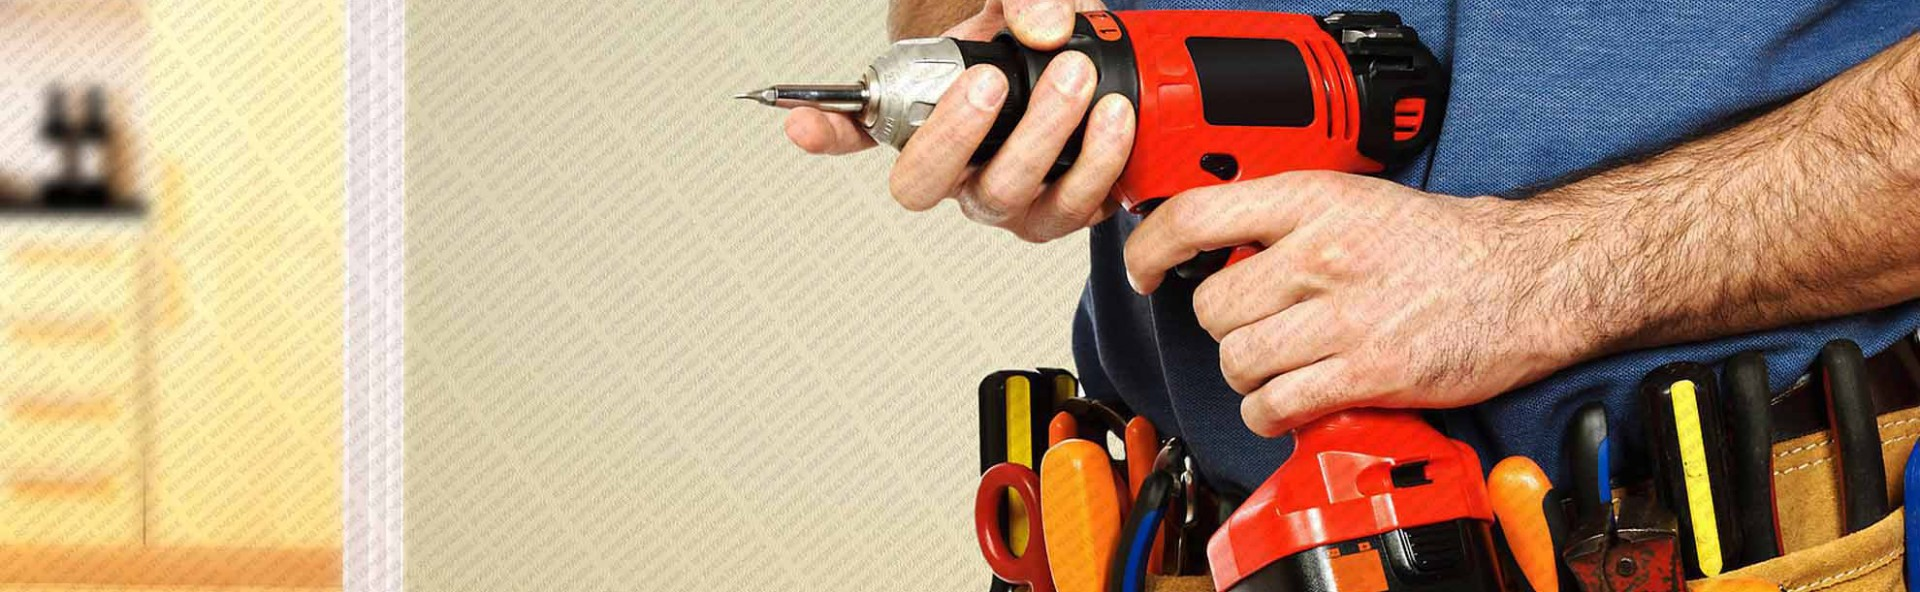 Handyman Wallpapers Top Free Handyman Backgrounds Wallpaperaccess